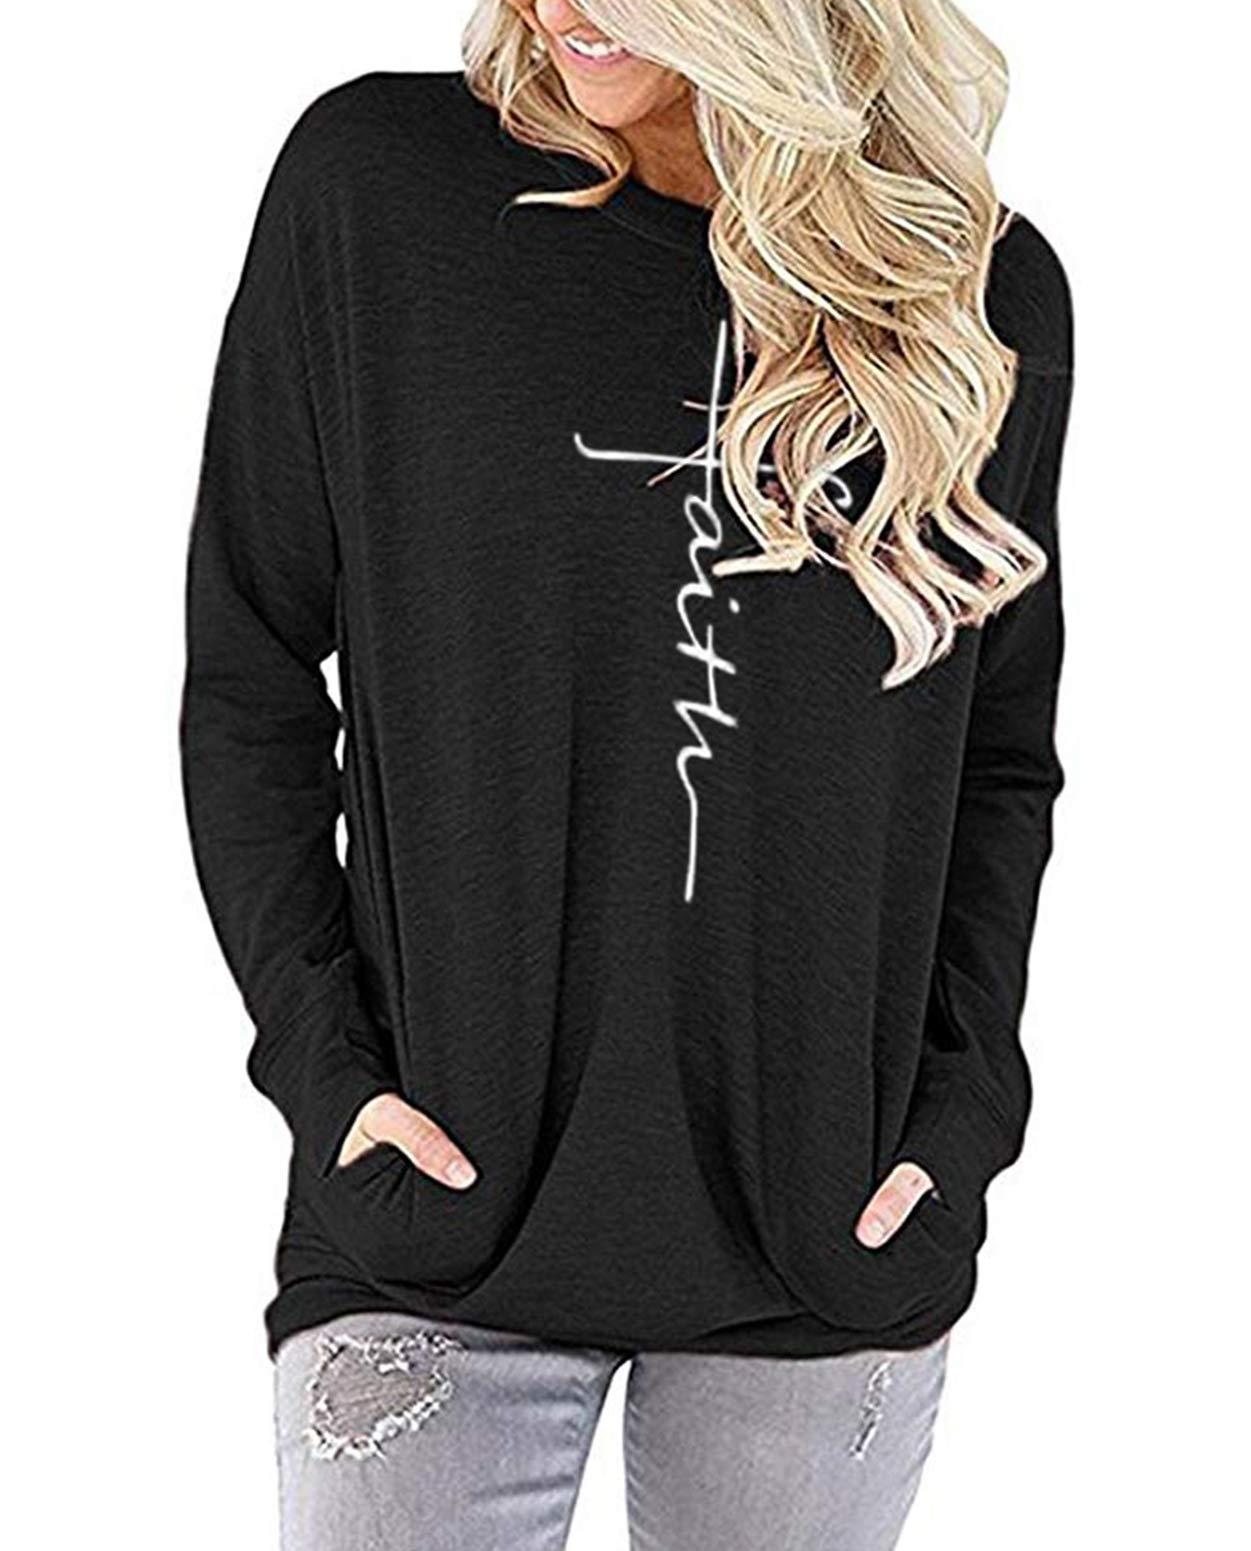 ZILIN Women's Casual Letter Print Crewneck T-Shirt Long Sleeve Tunic Tops Sweatshirt with Pockets